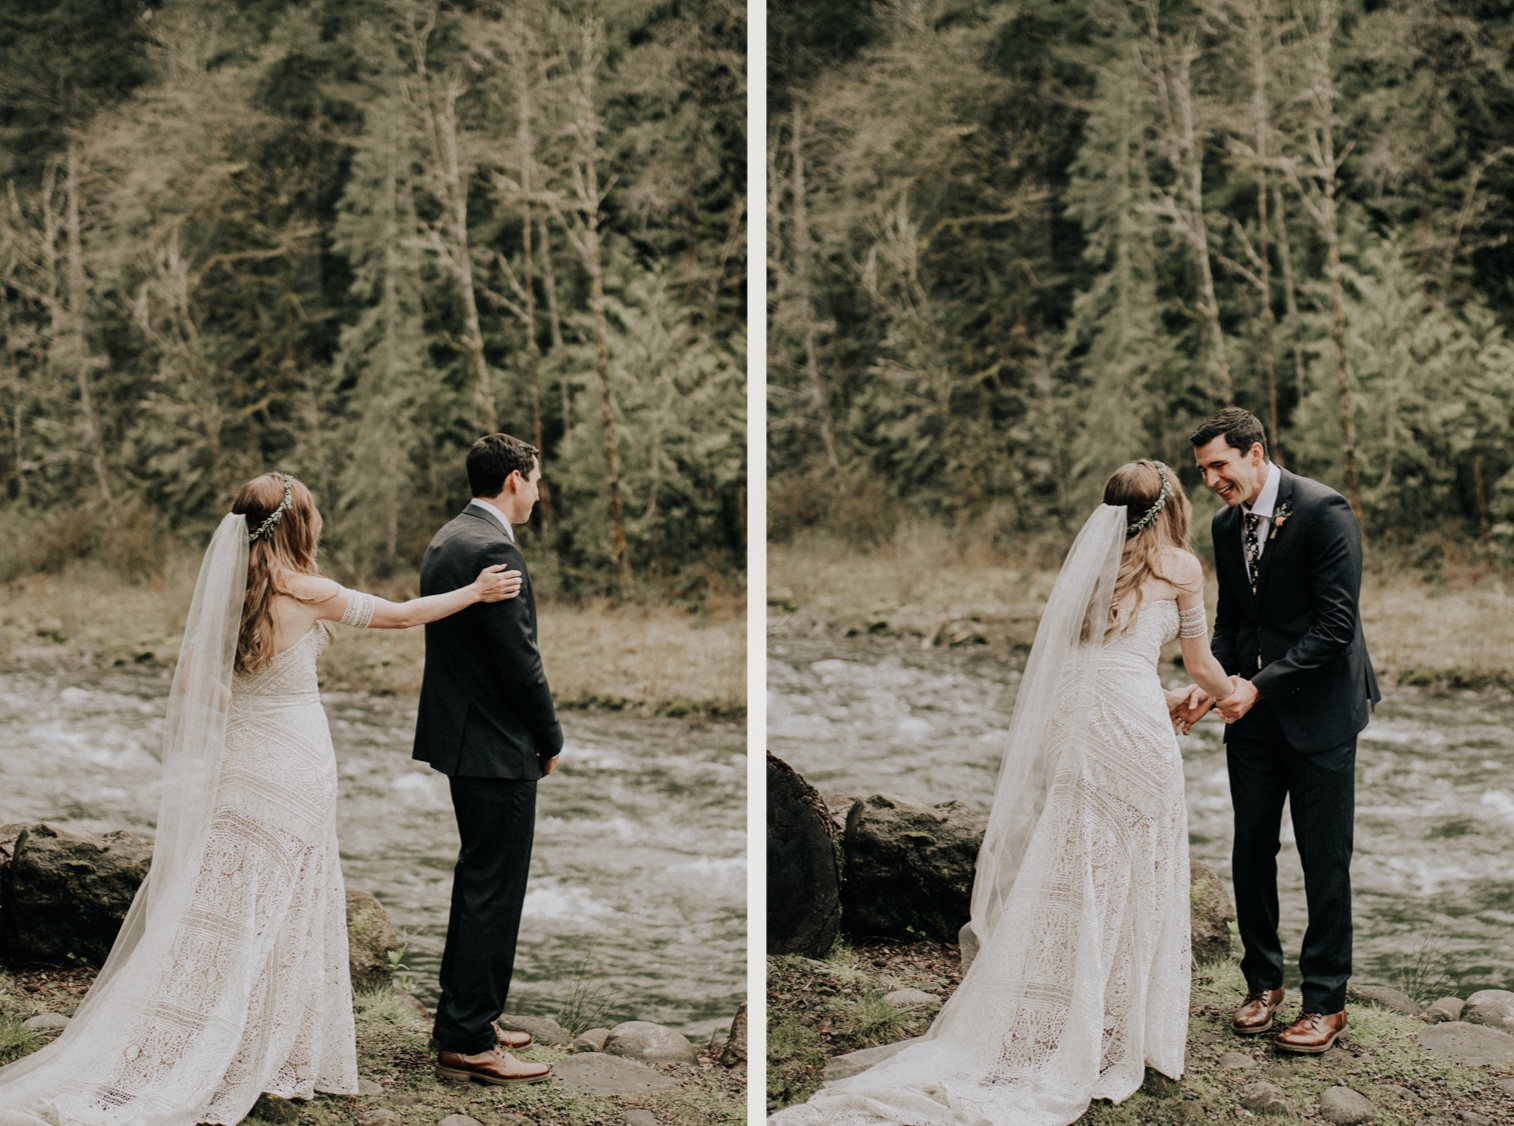 Oregon+elopement+-+Tamanawas+Falls+trail